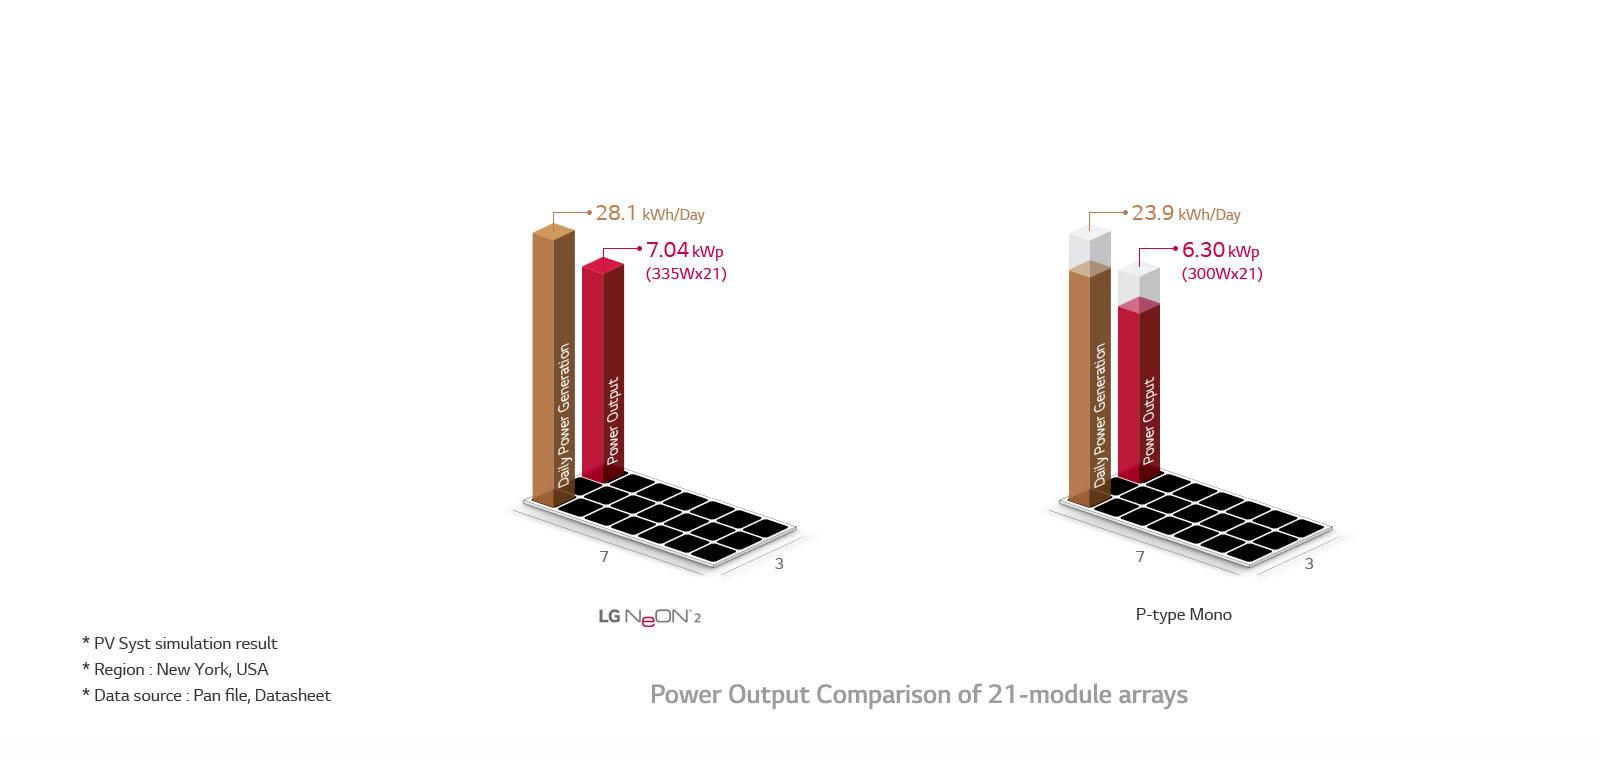 NISU Pin mặt trời LG Neon2 330w hiệu năng cao